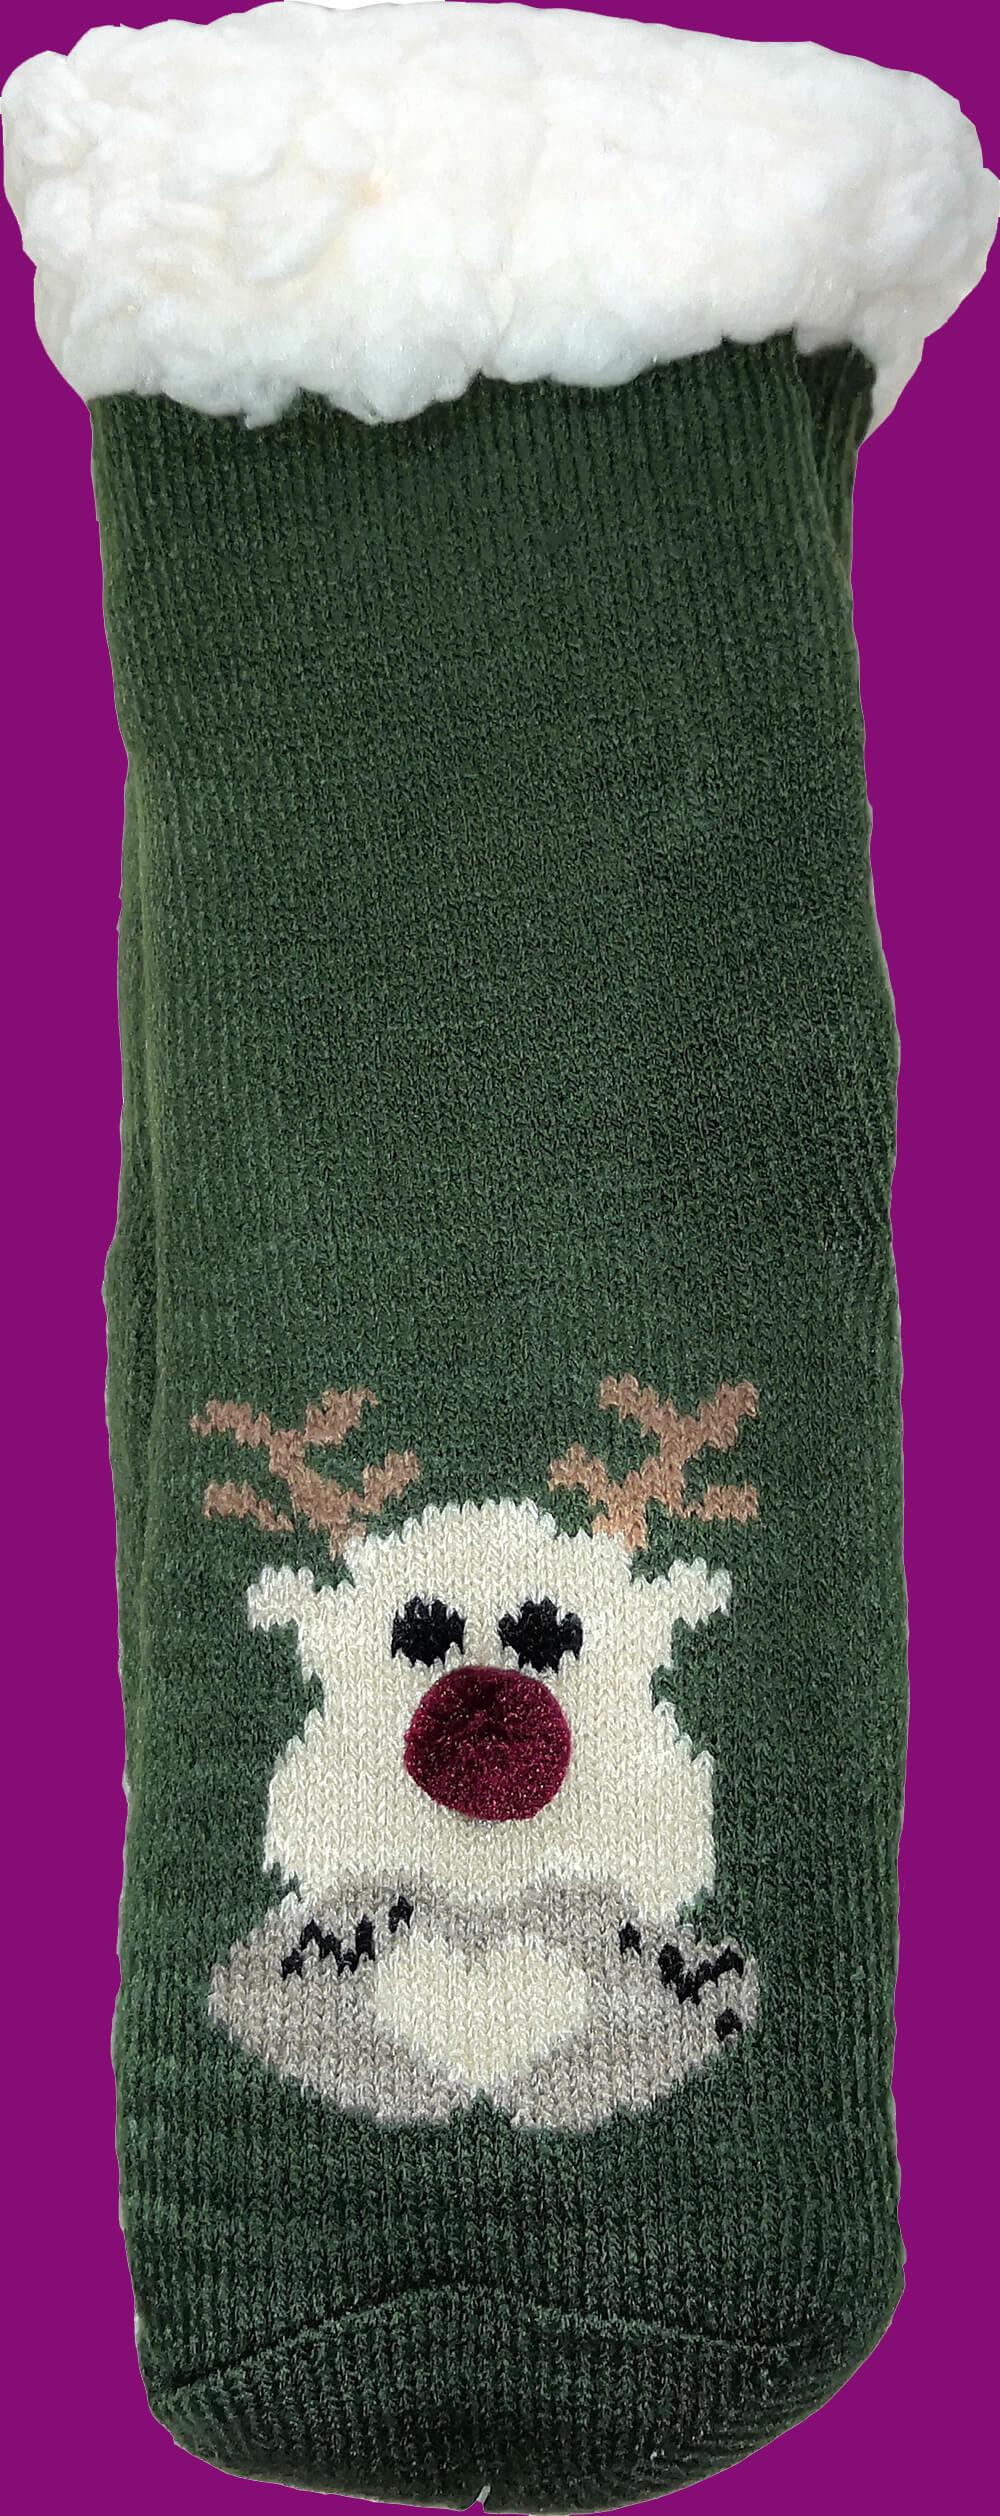 Детские носки-тапочки LookEN SM-HL-7211D-gr 26-28 розміру зеленого цвета.